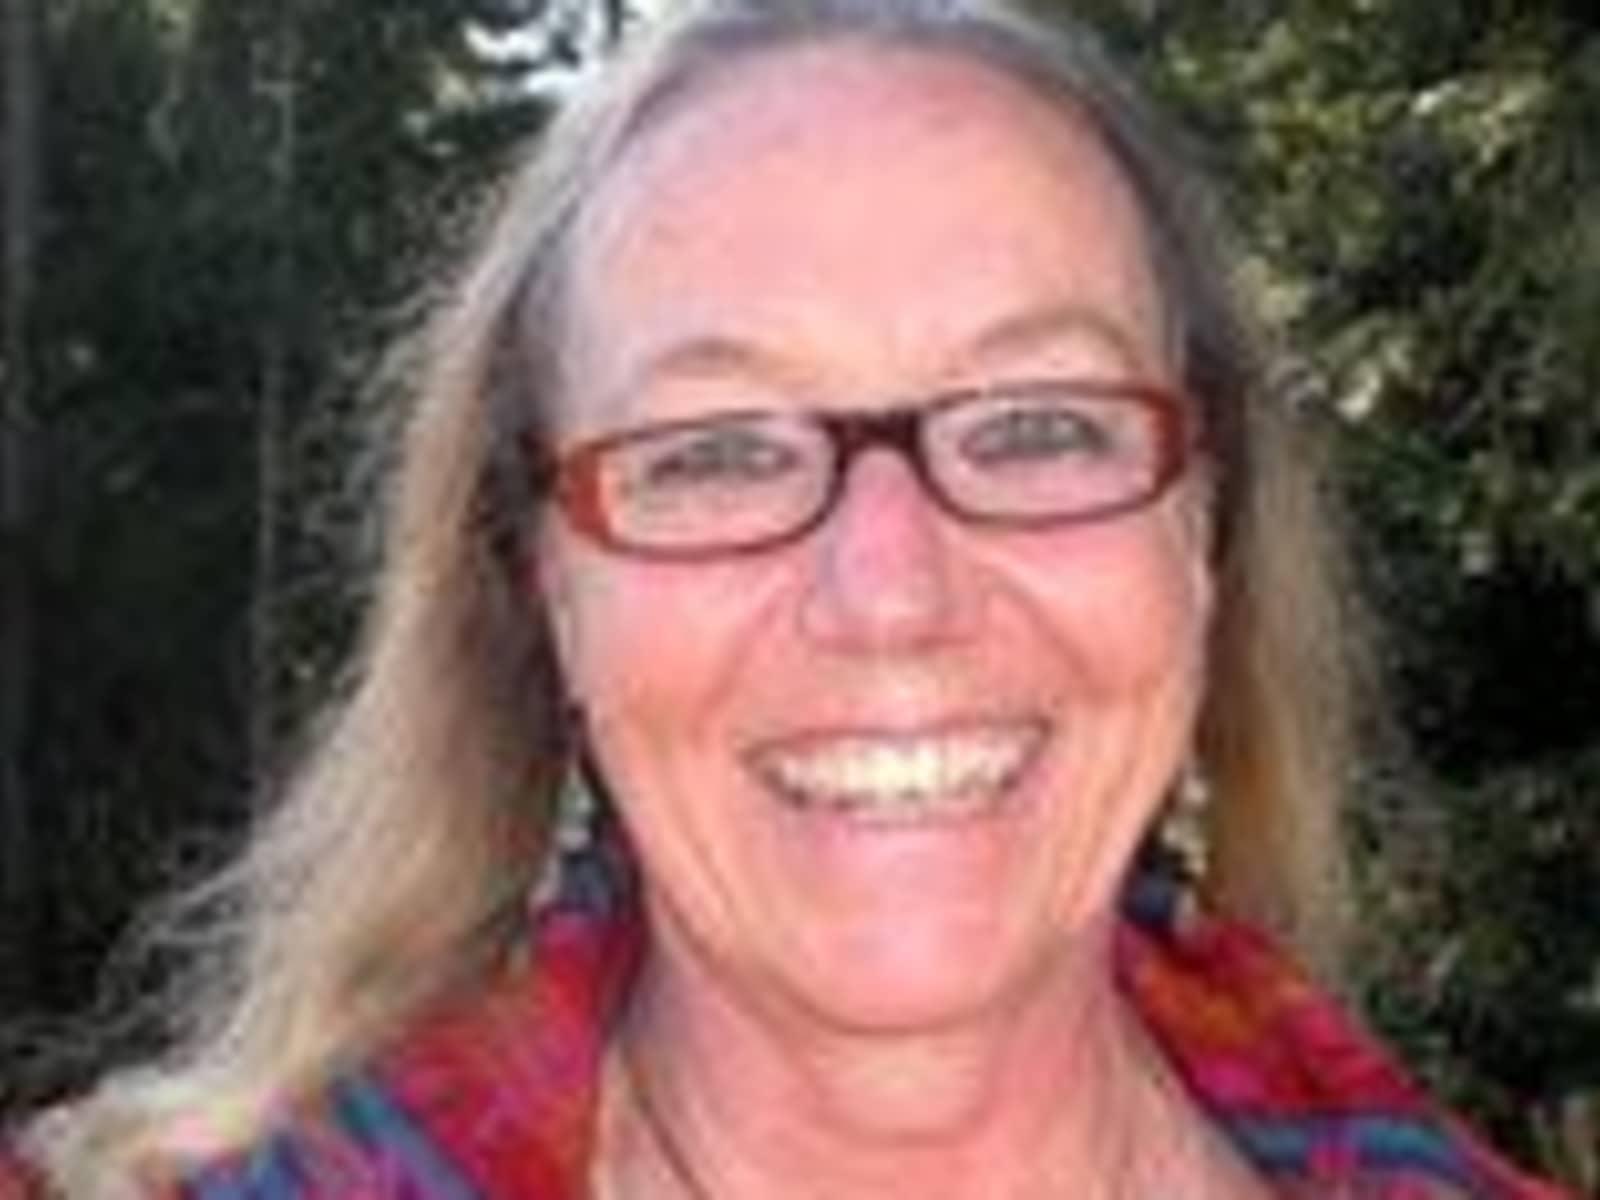 Linda from Felton, California, United States